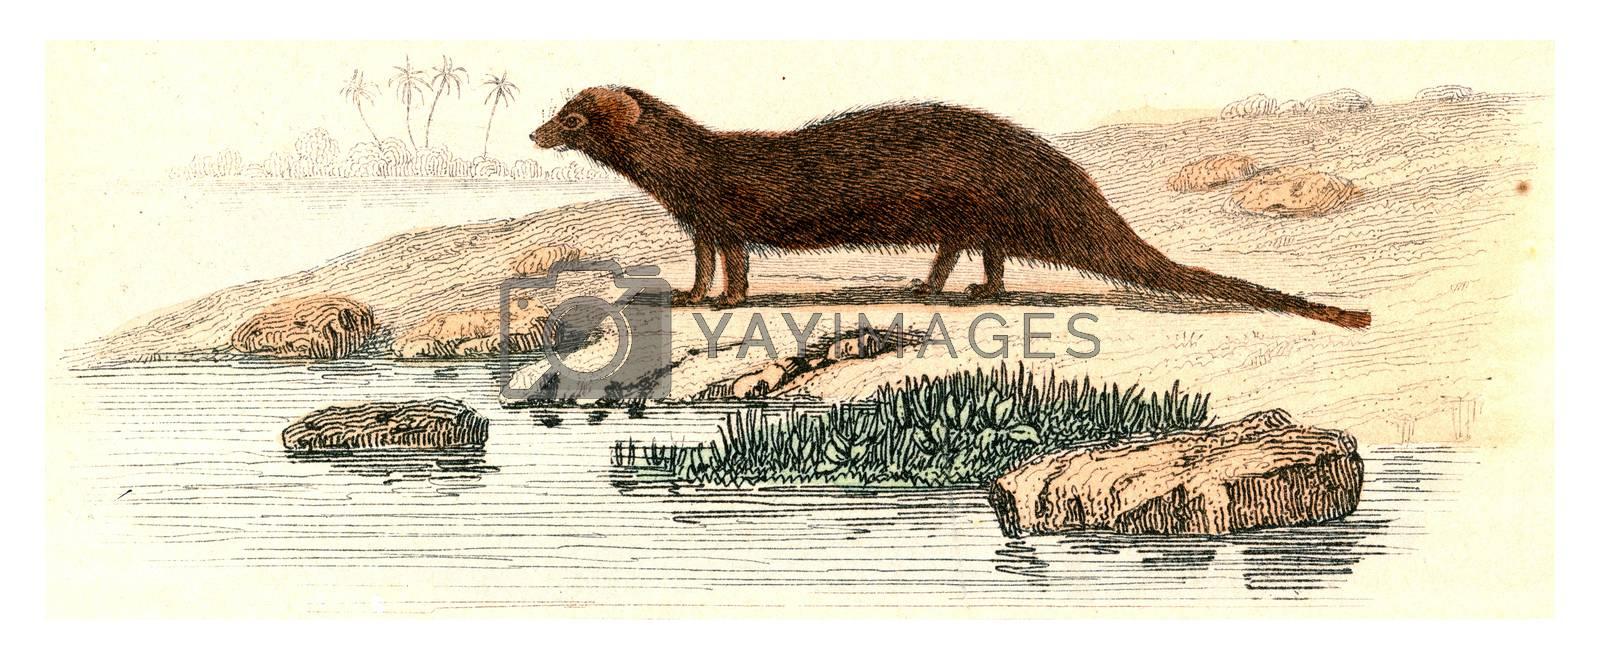 Mongoose, vintage engraved illustration. From Buffon Complete Work.